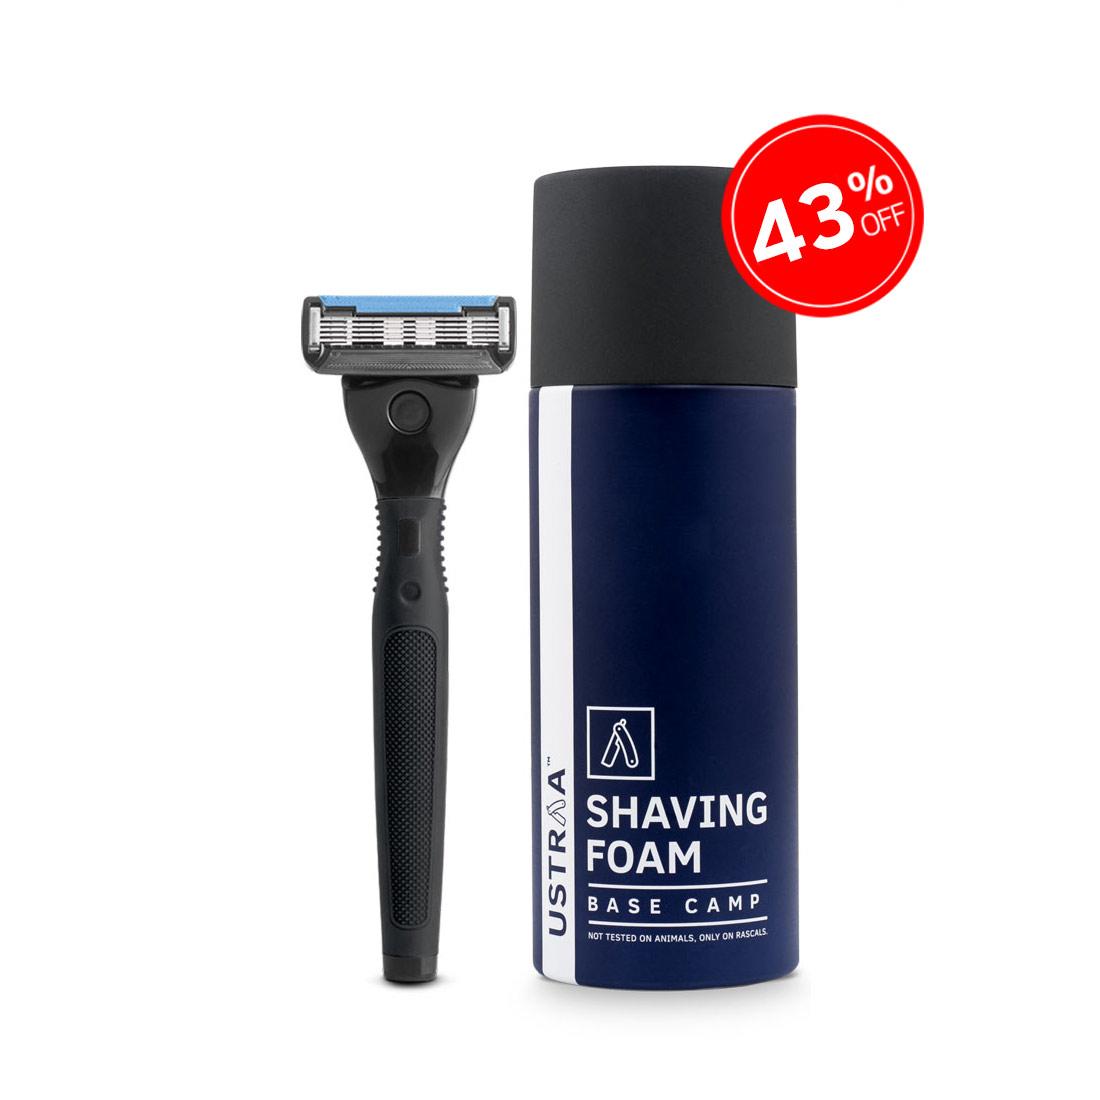 Gear 5 Razor(Black) and Shaving Foam(Base Camp)